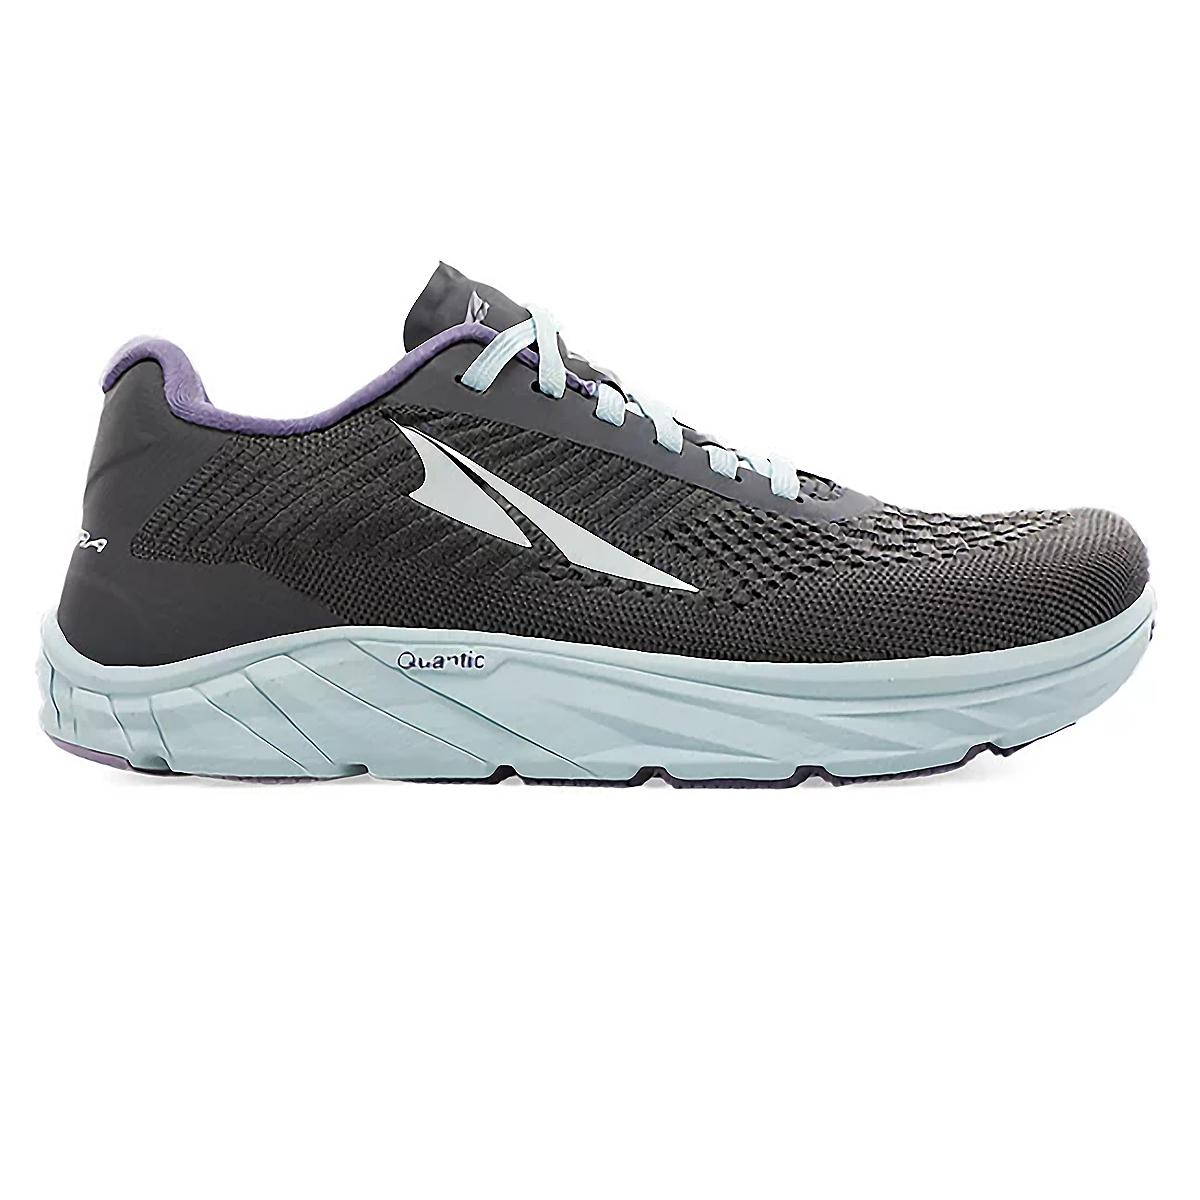 Women's Altra Torin 4.5 Plush Running Shoe - Color: Dark Gray - Size: 5.5 - Width: Regular, Dark Gray, large, image 1